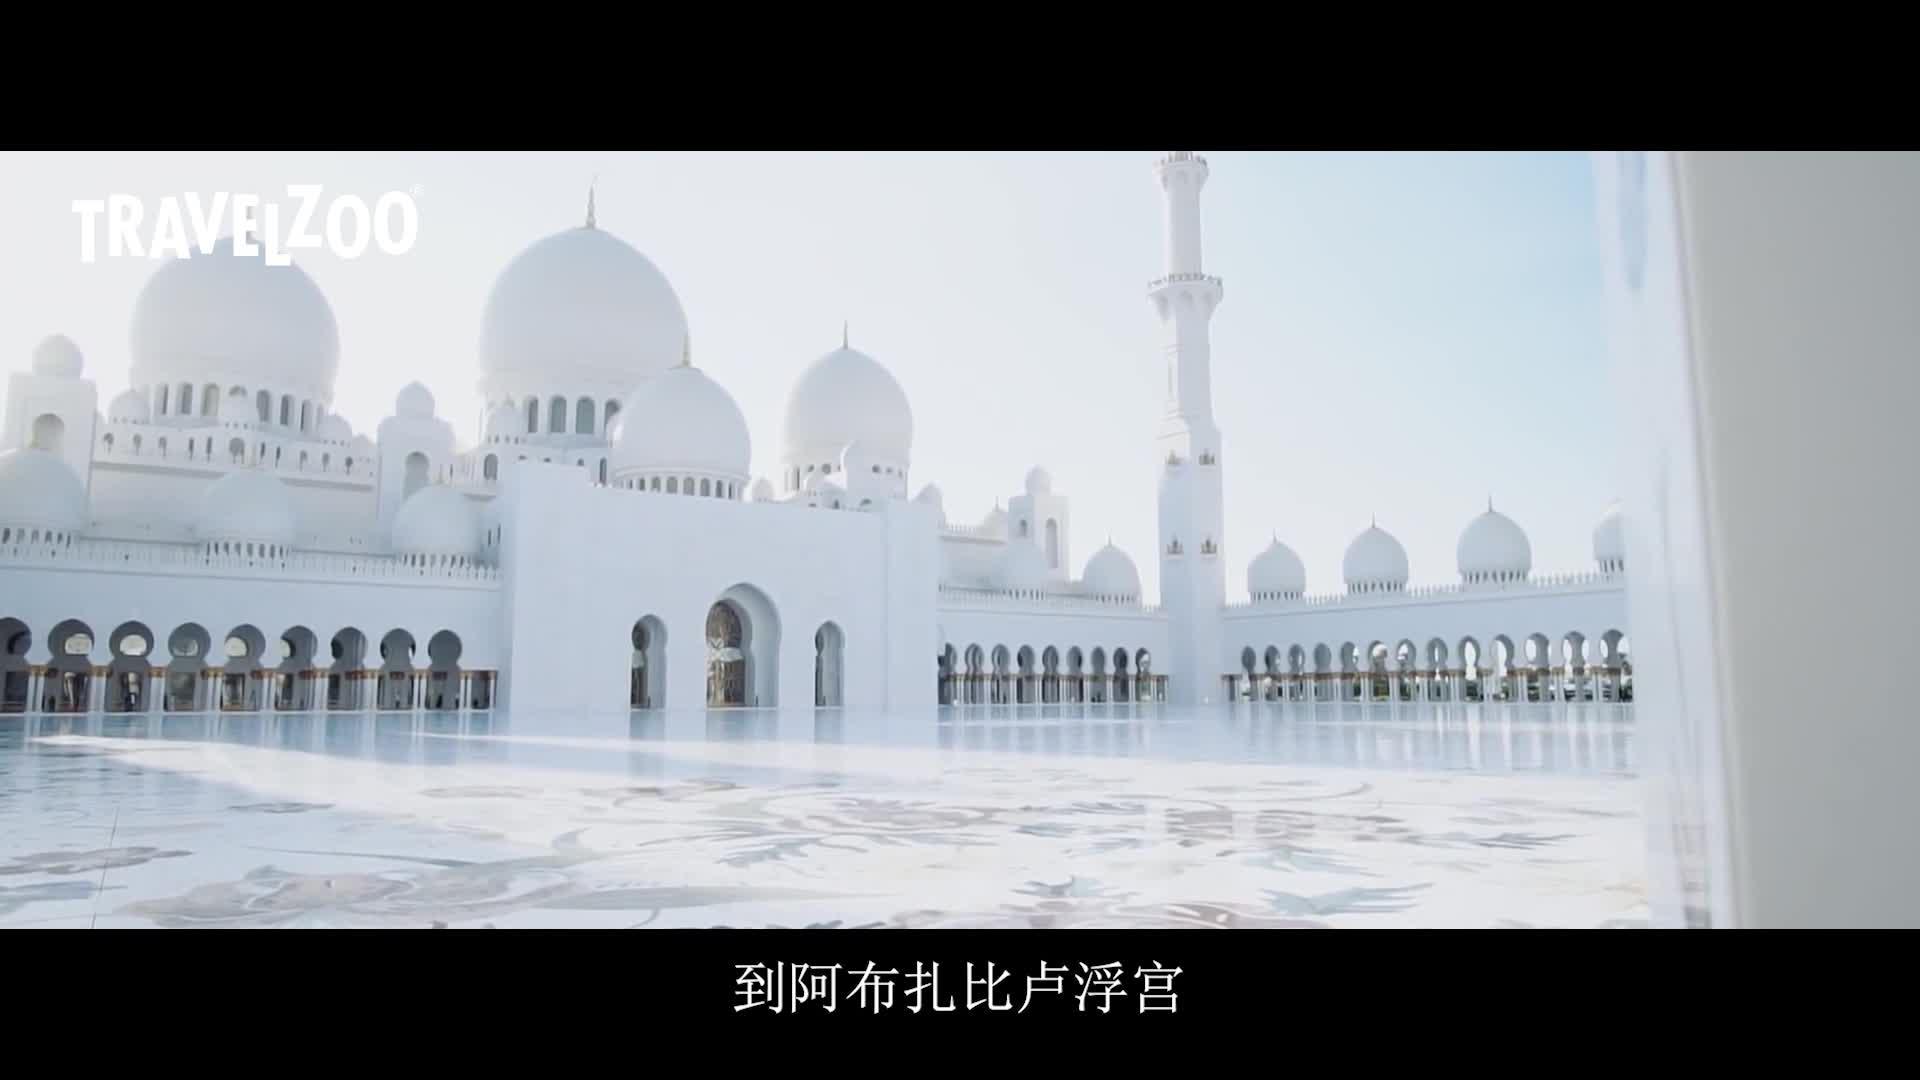 Travelzoo秋冬,开启美和食欲的季节!